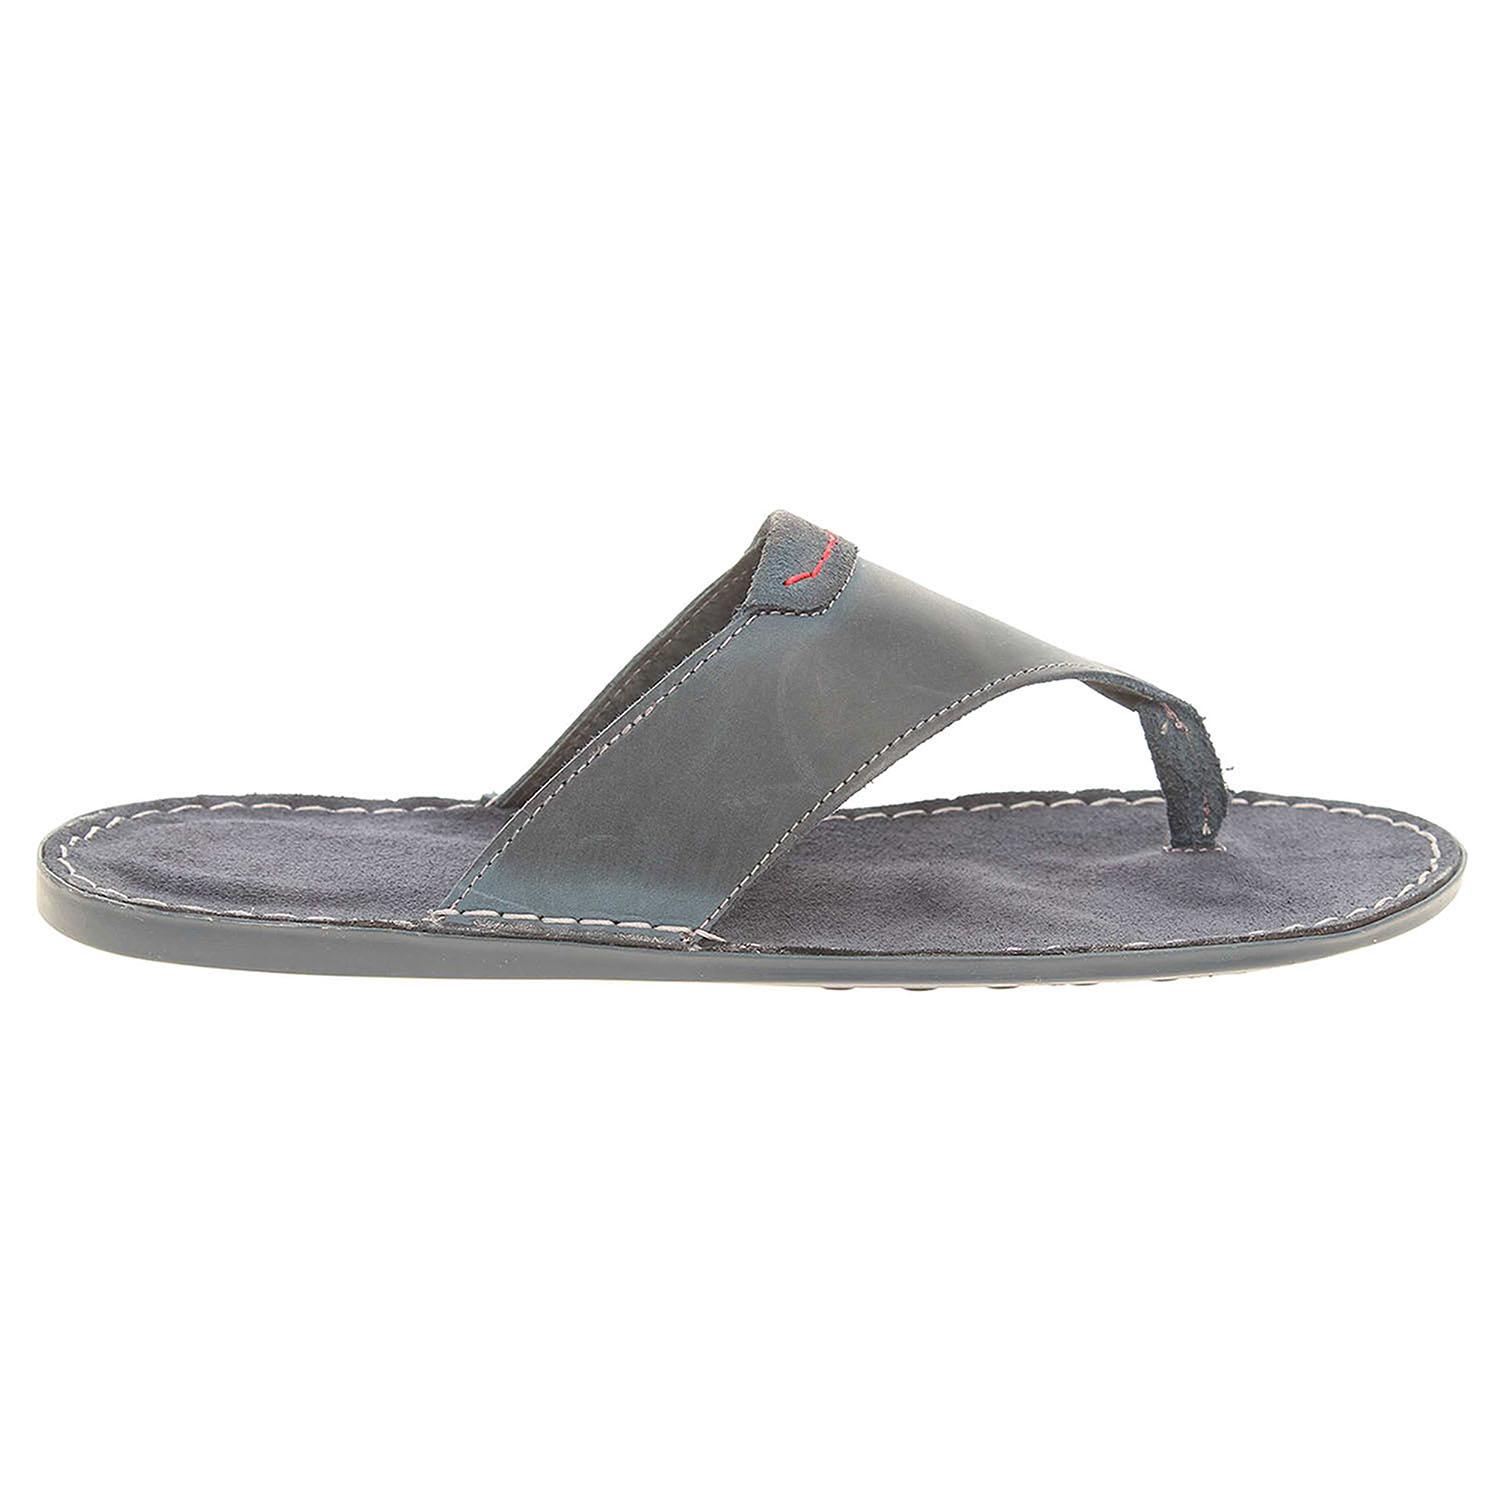 Ecco Pánské pantofle F 0376 modré 24900157